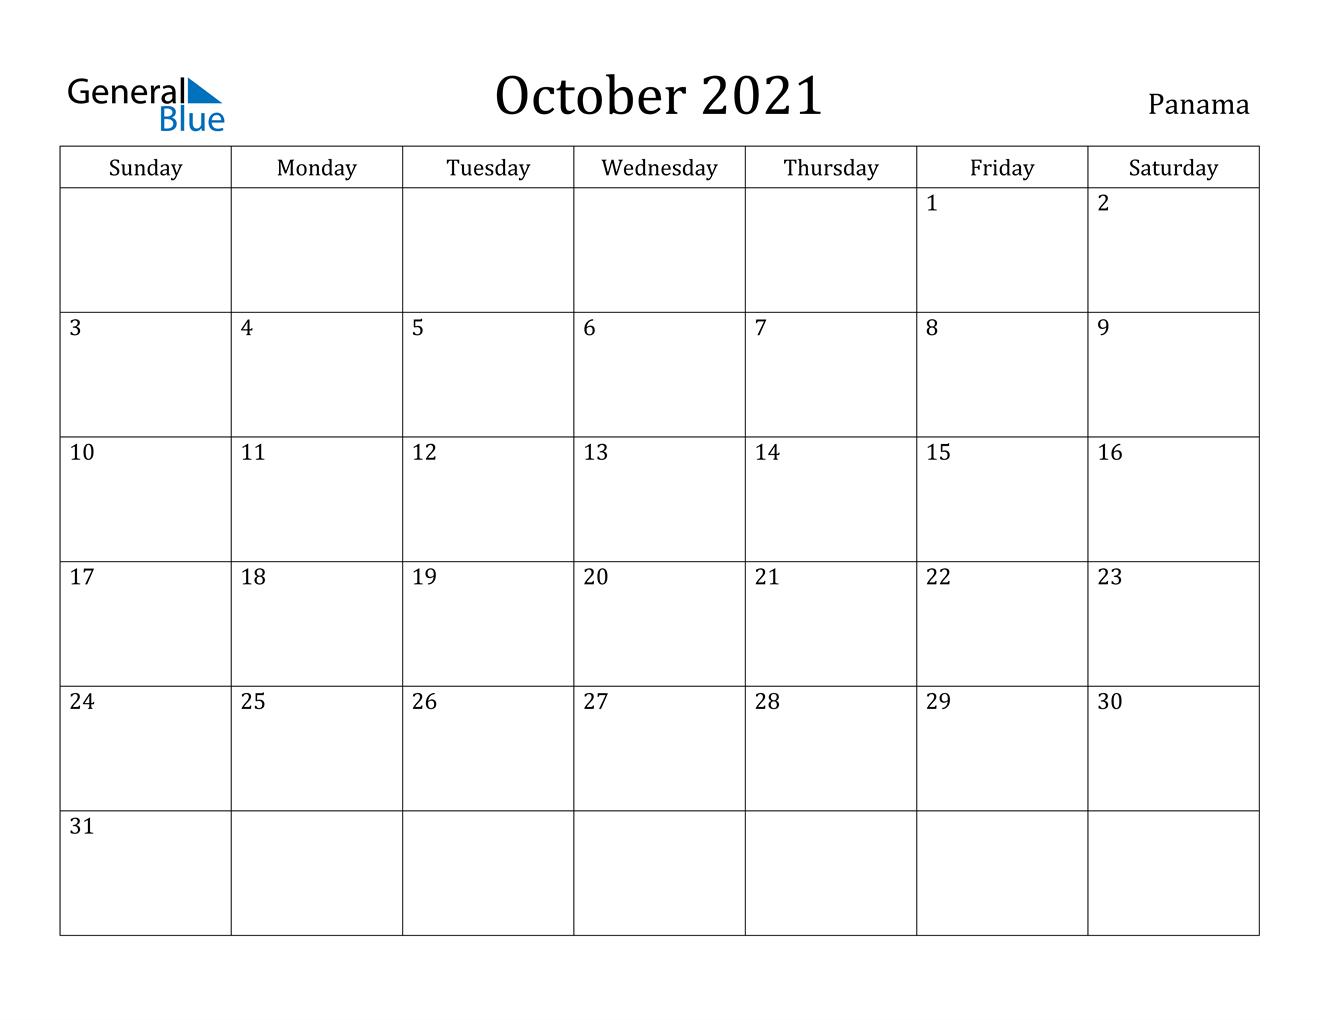 October 2021 Calendar - Panama